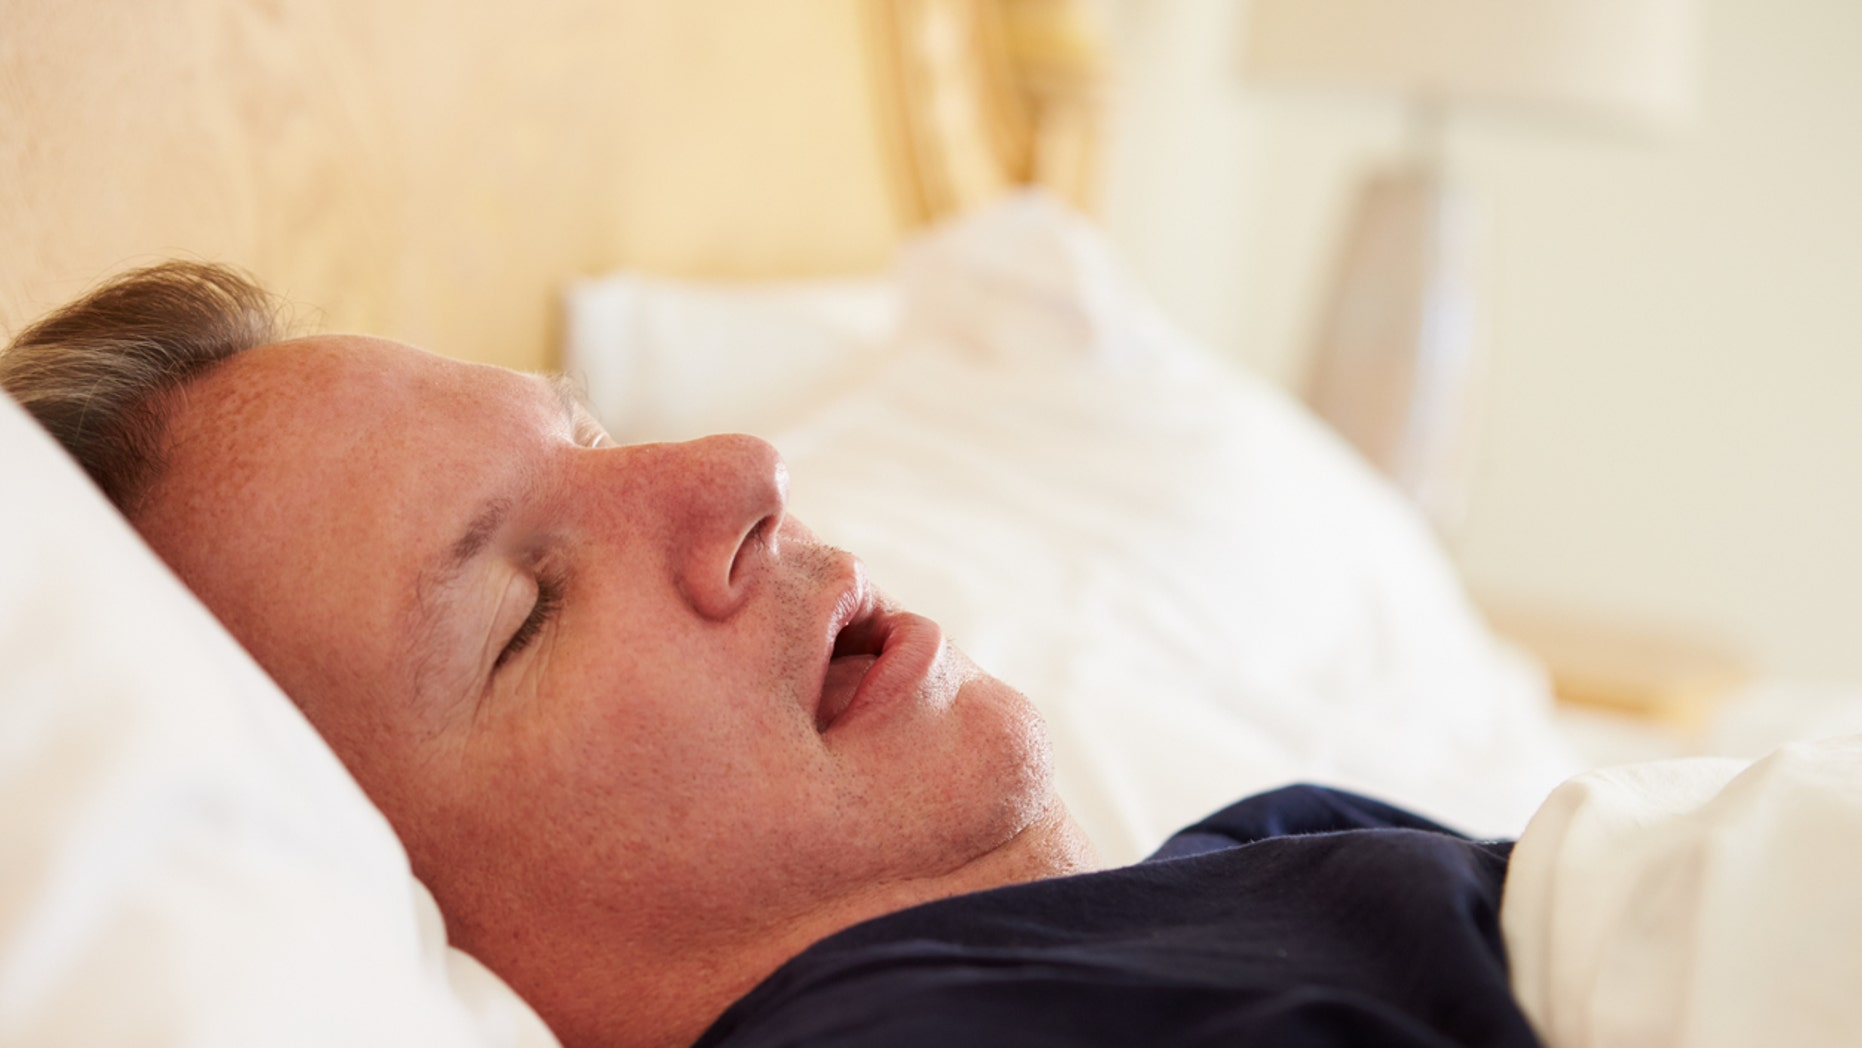 Sleep Apnea May Be Tied to Silent Strokes